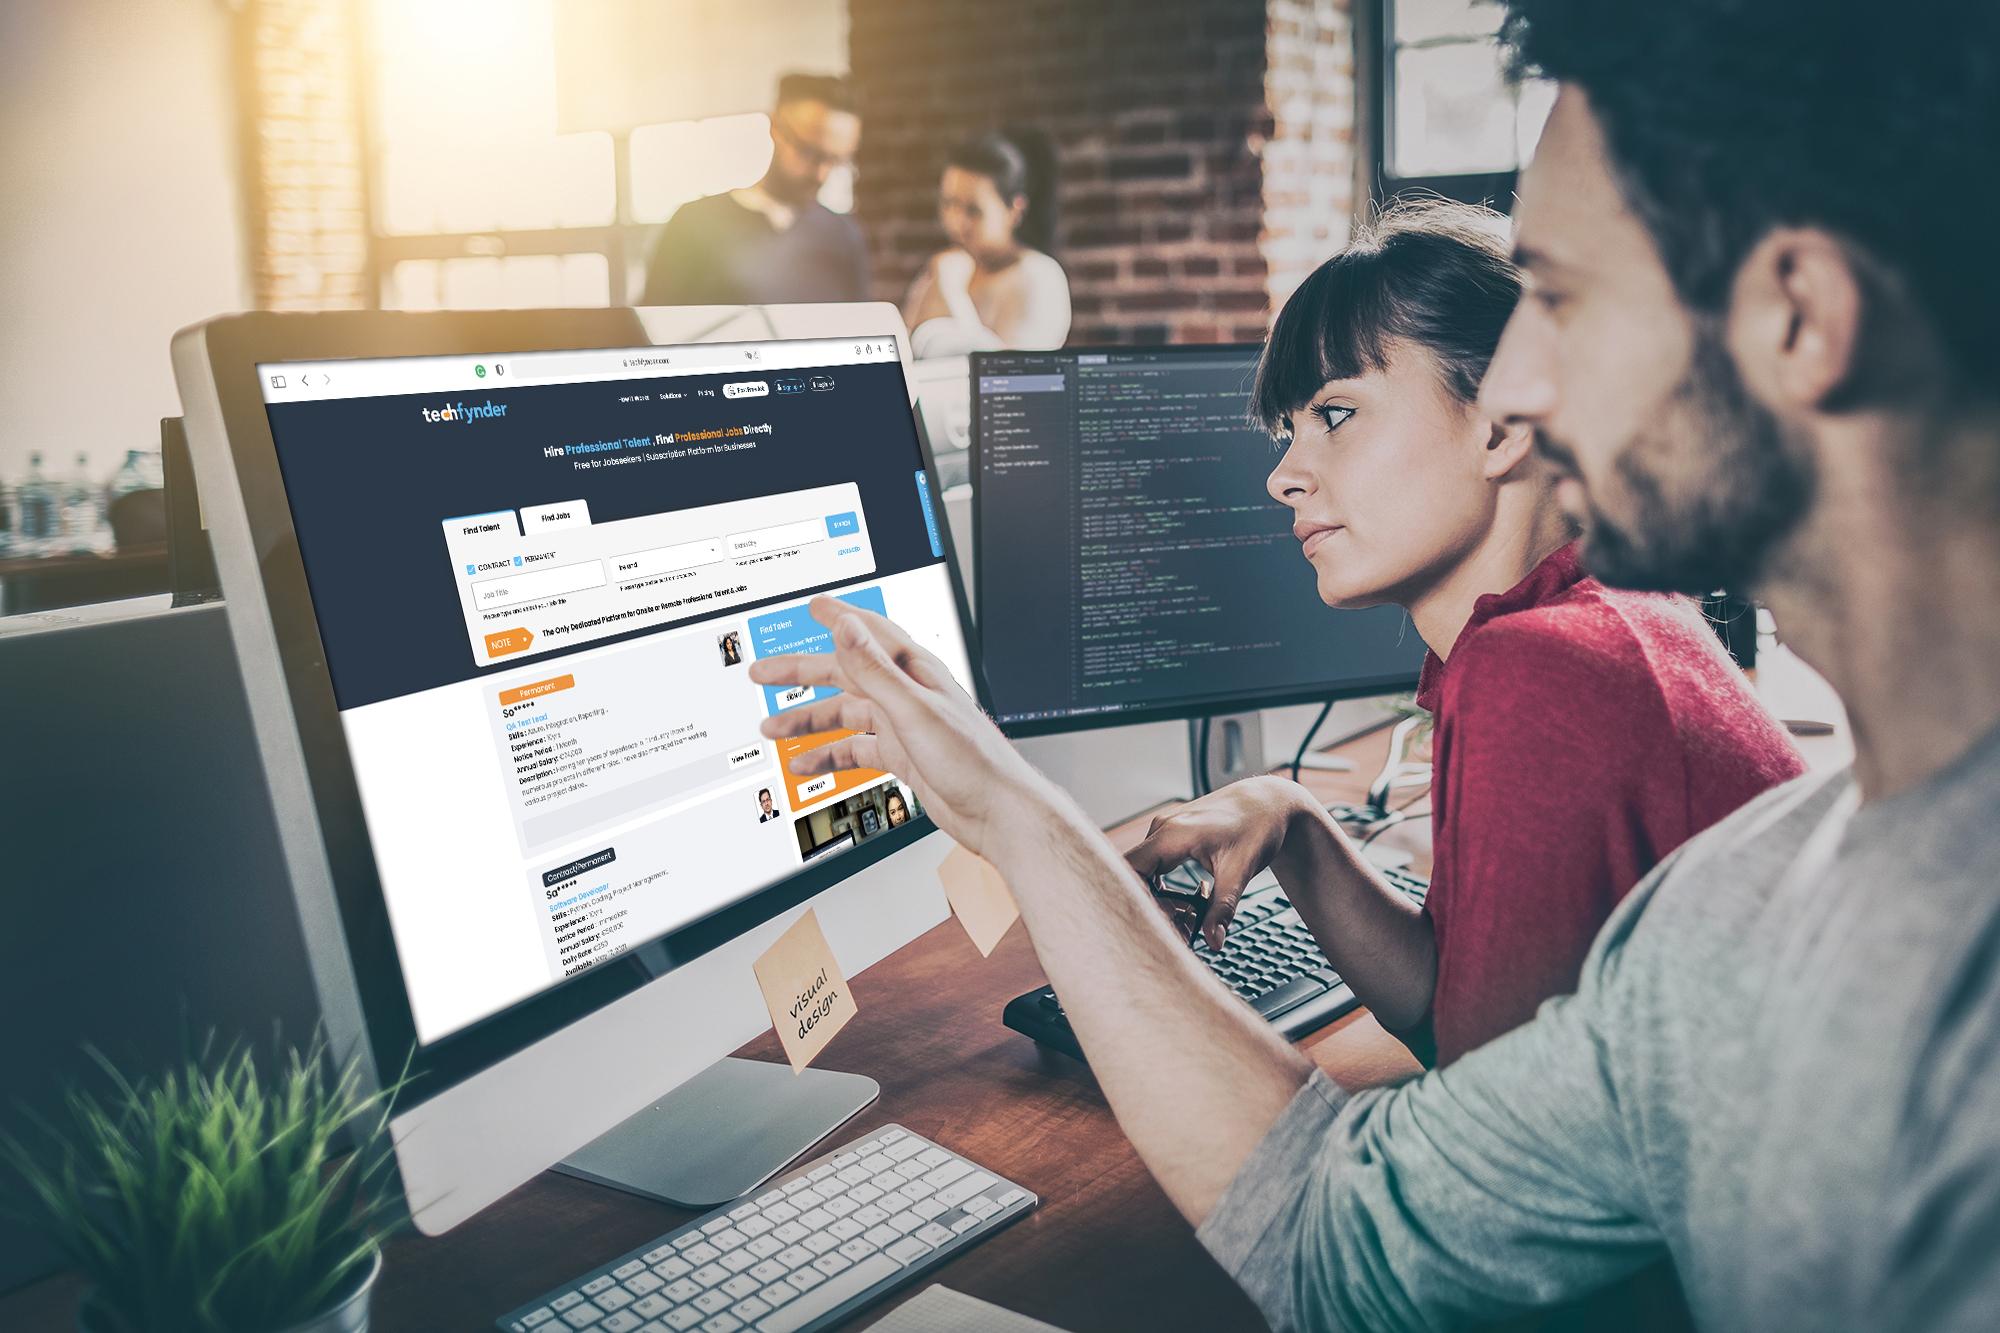 Techfynder-find-jobs